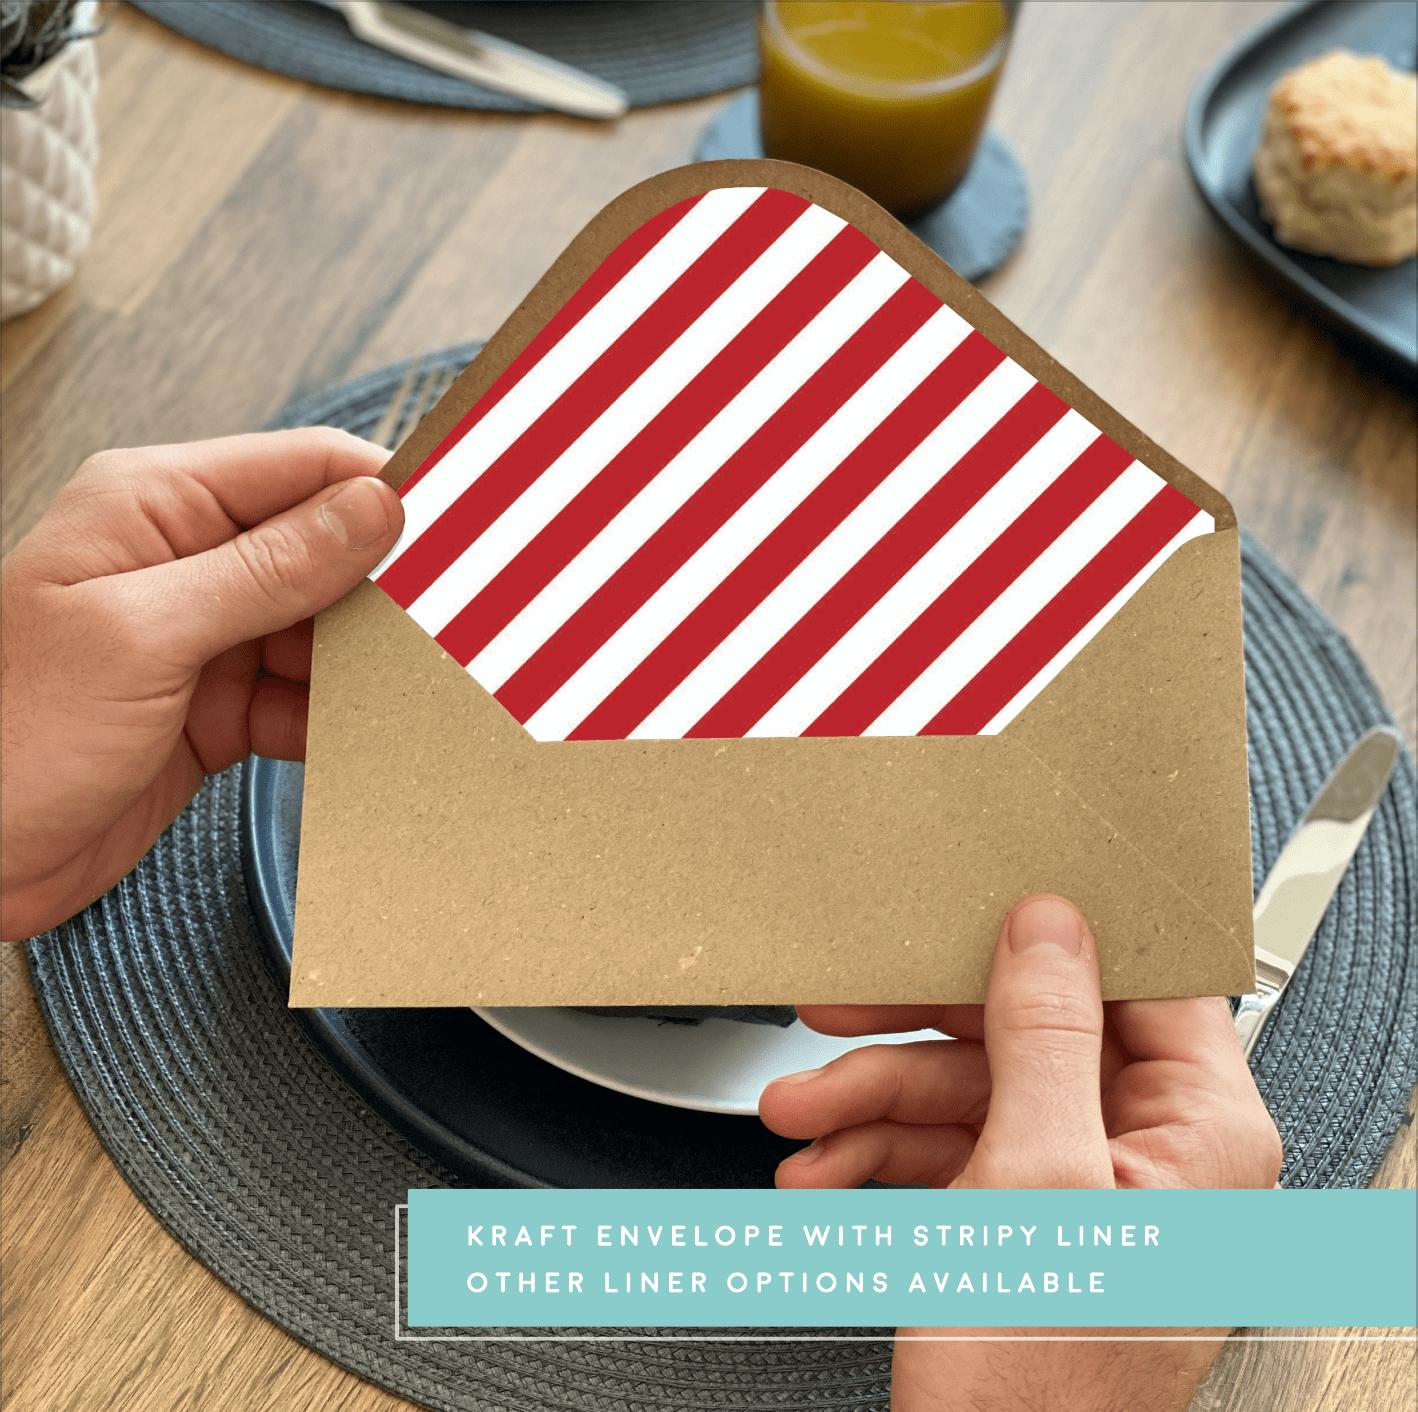 Rodo Creative Stripy envelope liner - Kraft